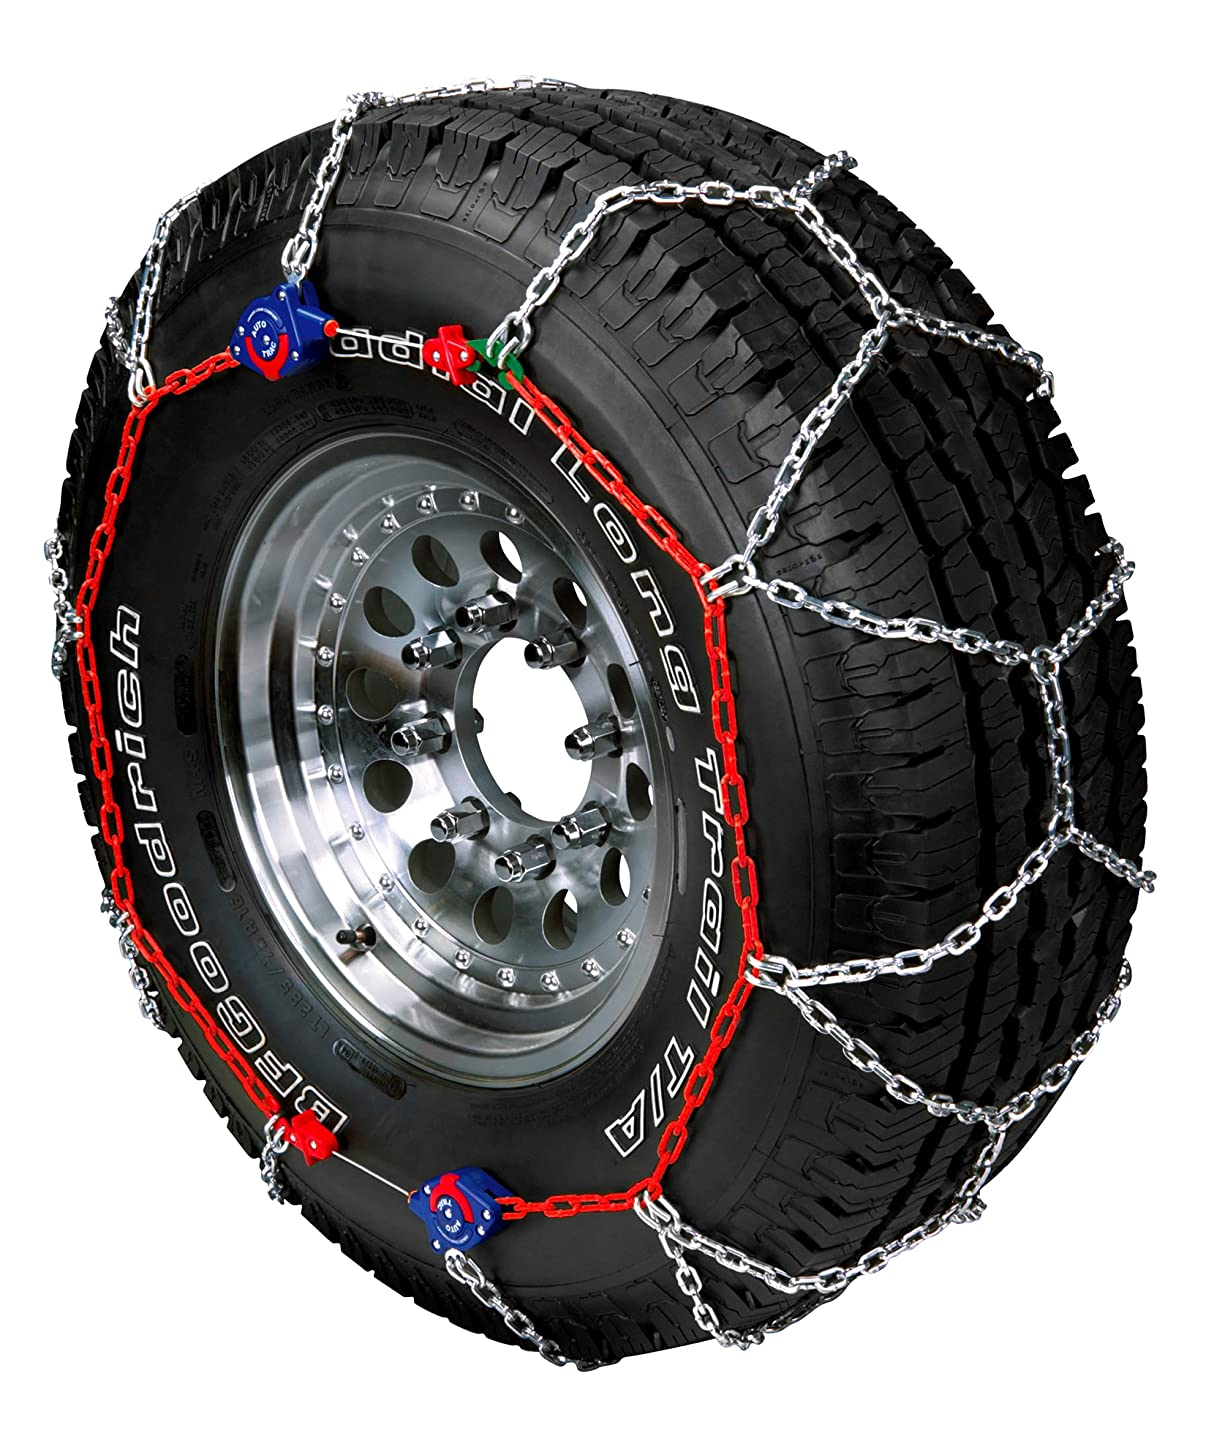 Peerless 0231905 Auto-Trac Light Truck/SUV Tire Traction Chain - Set of 2